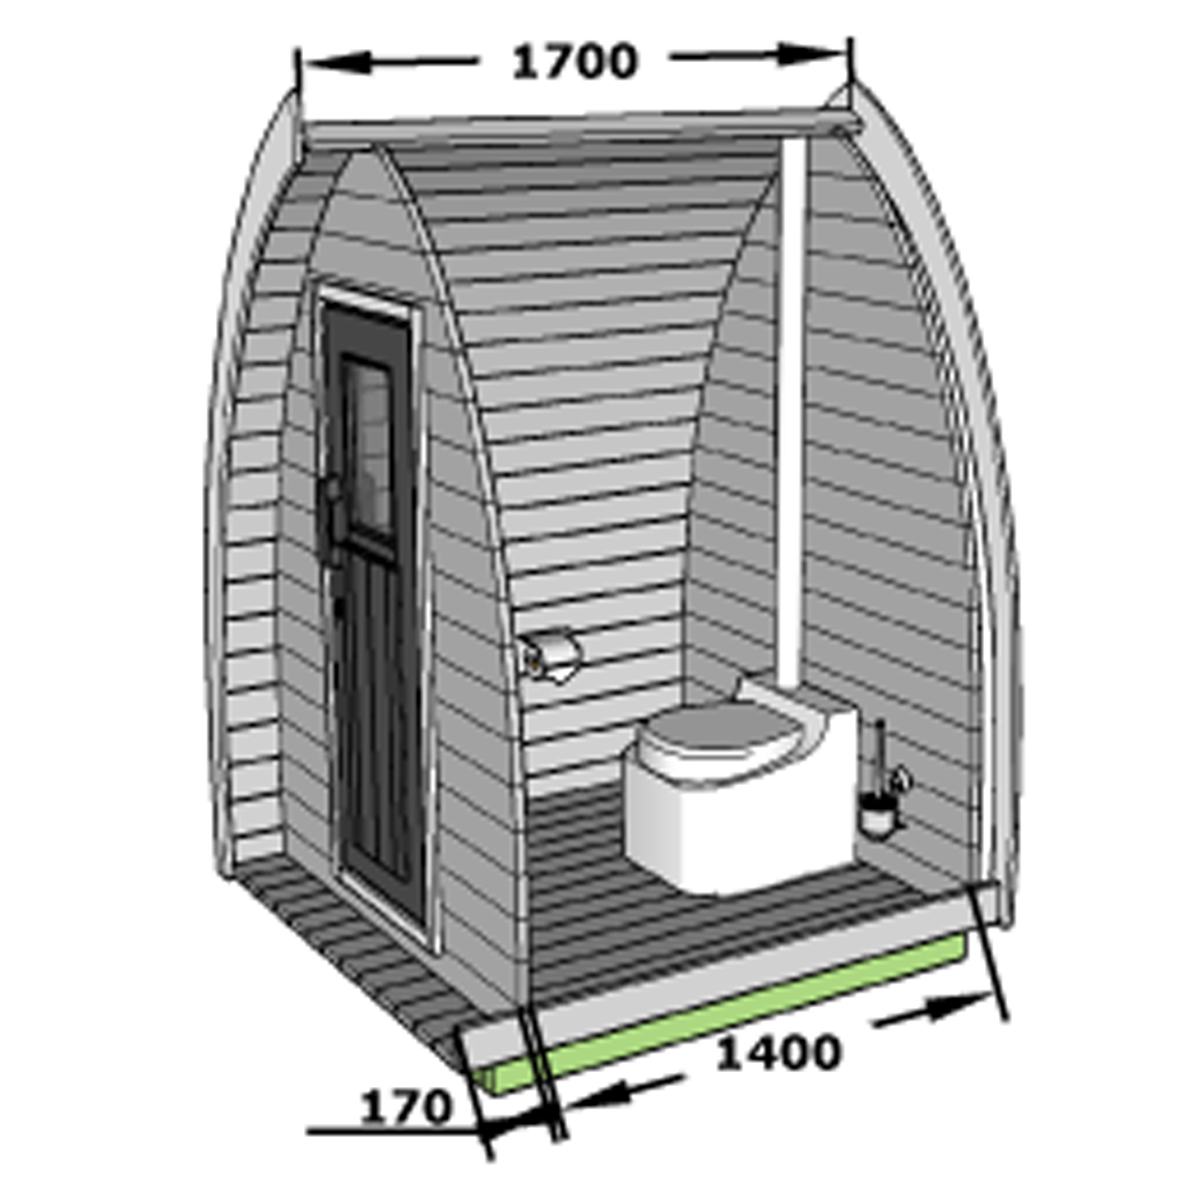 Pod toilet layout